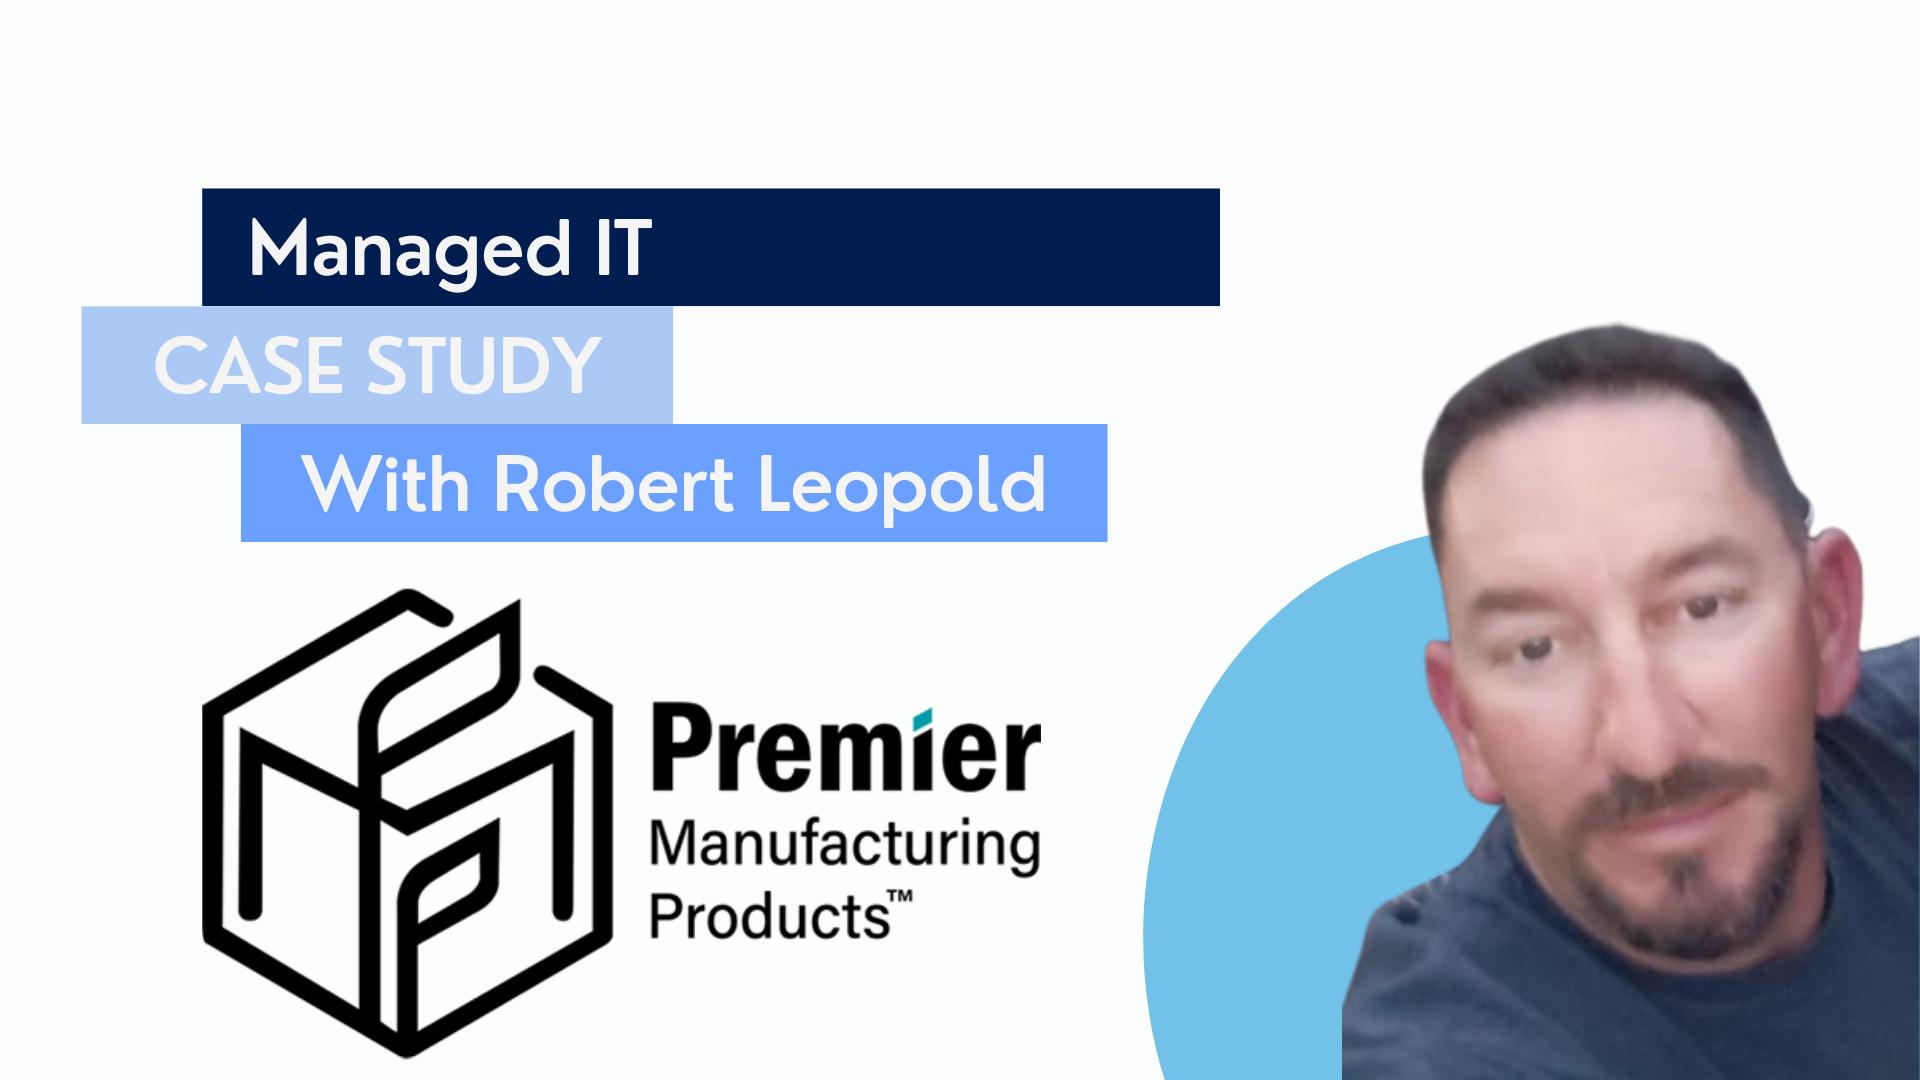 Customer Interviews, Managed IT, Robert Leopold, Premier MP